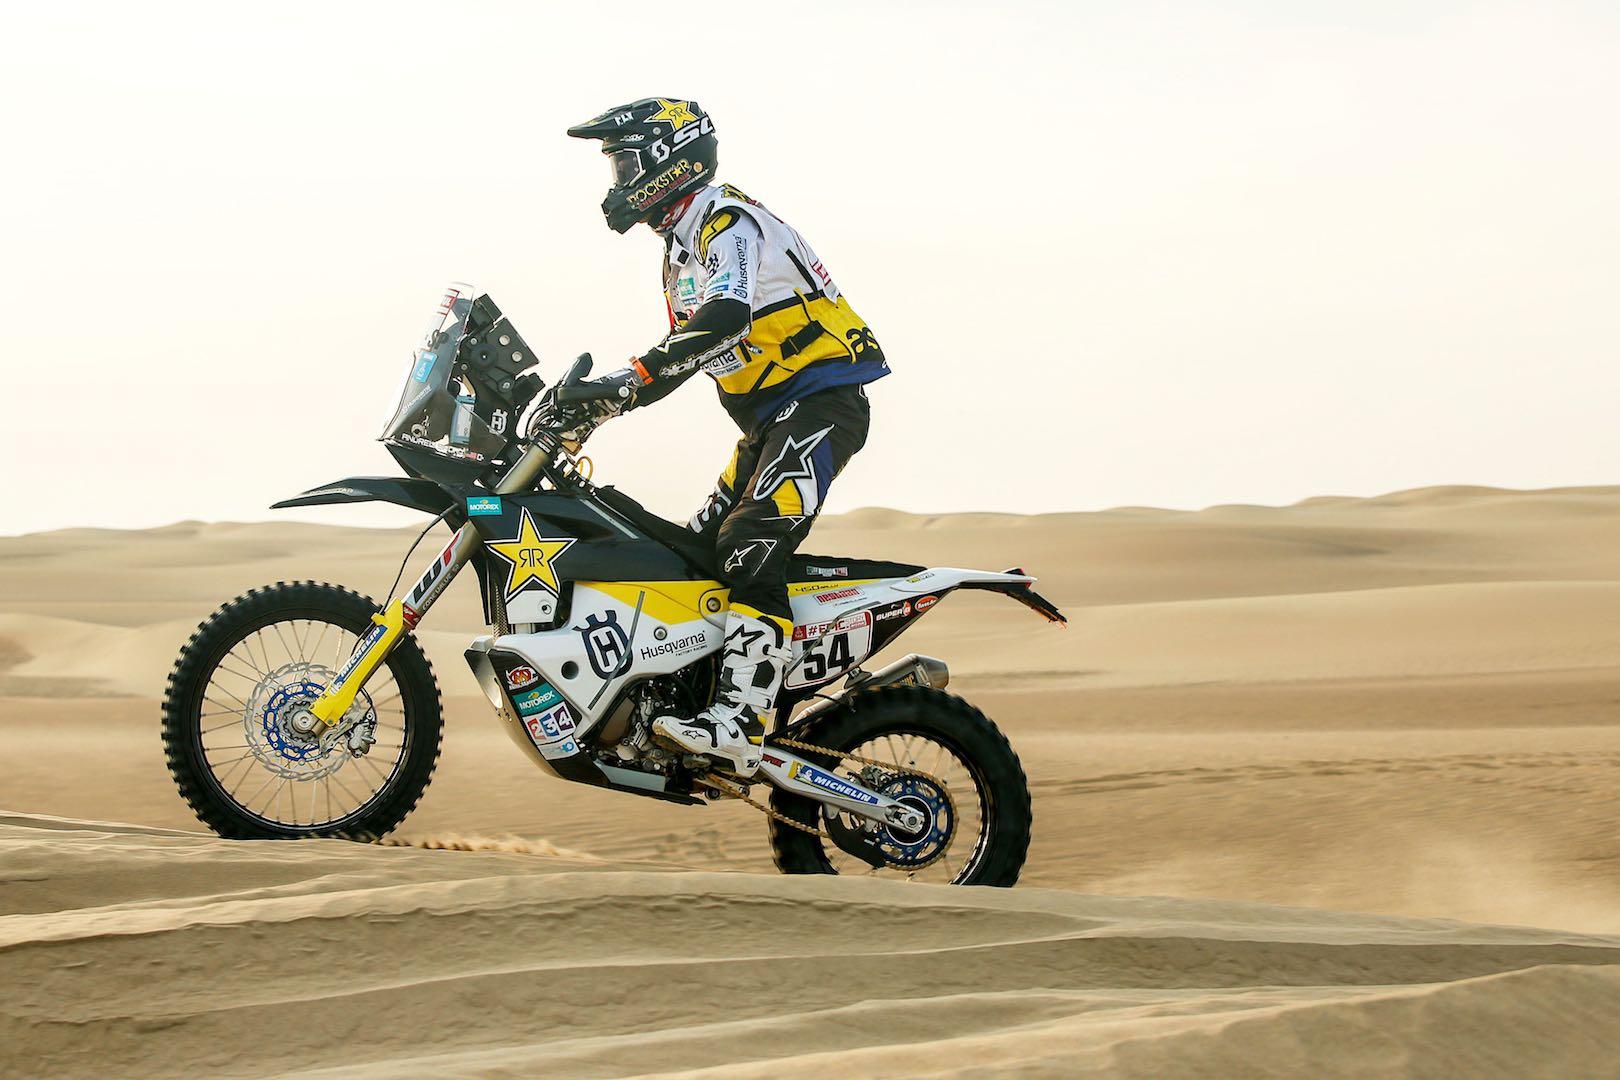 Husqvarna Andrew Short 2019 Dakar Rally Preview